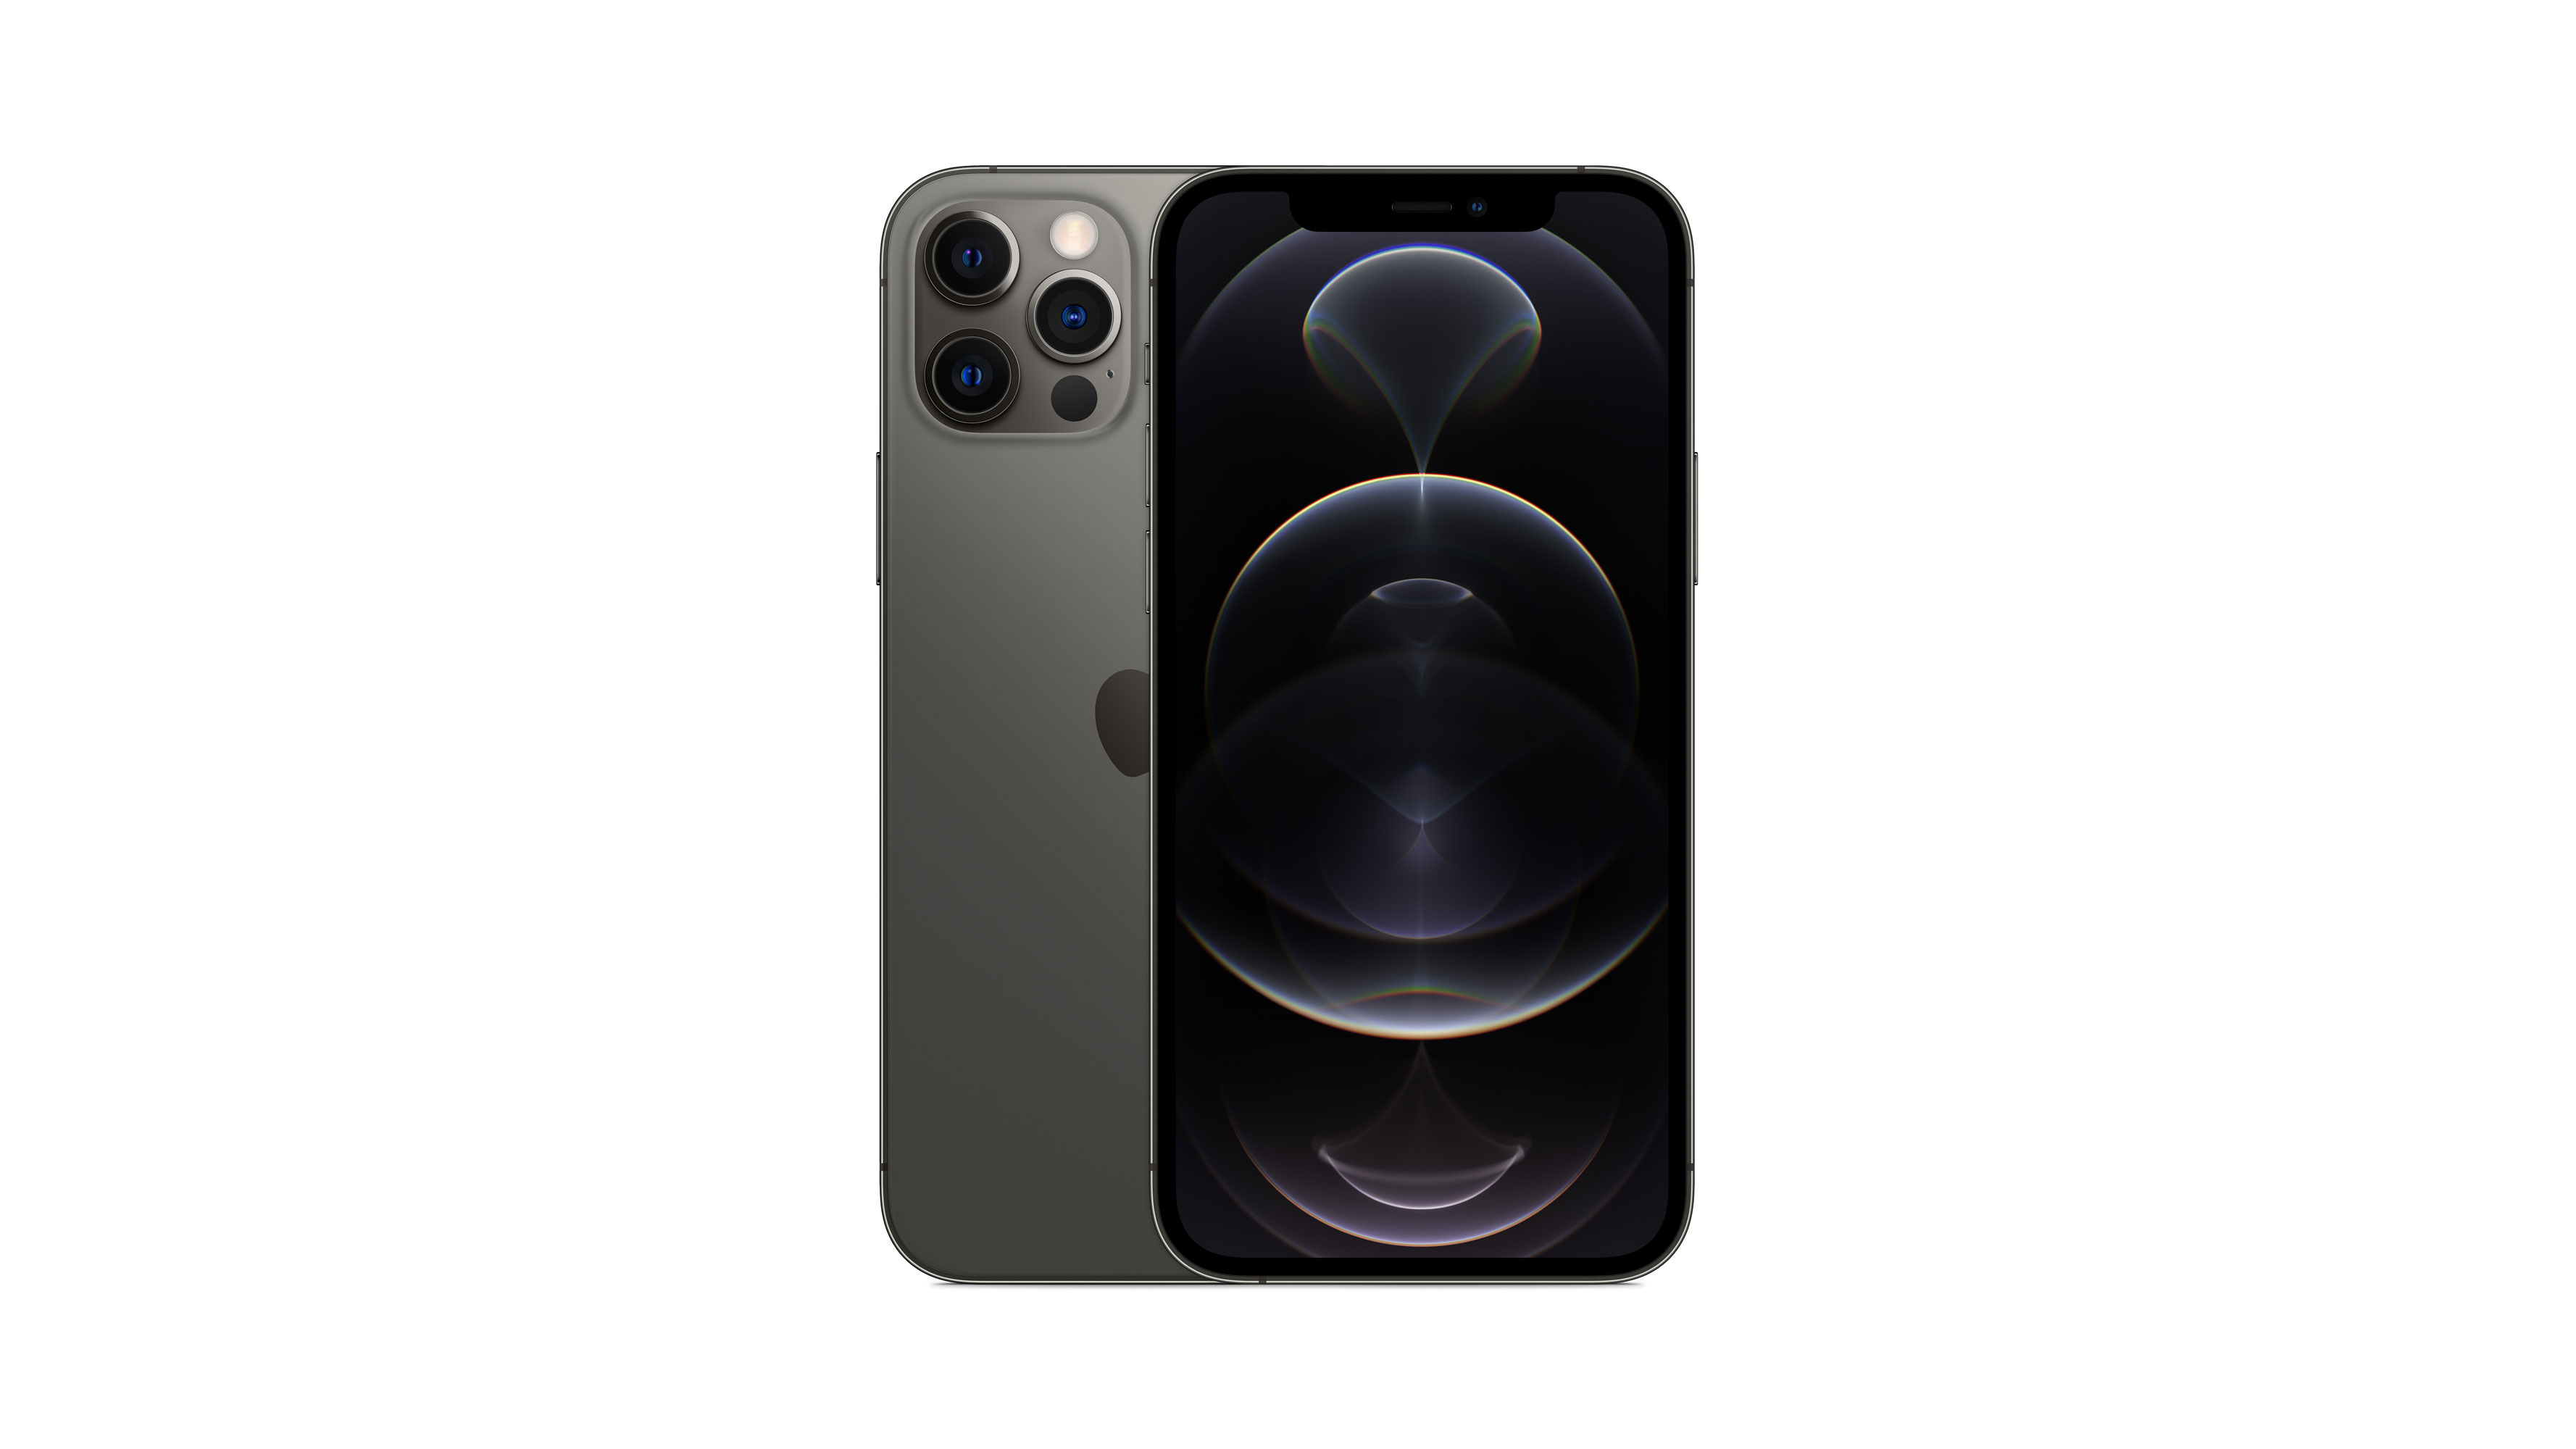 iPhone 12 Pro in graphite